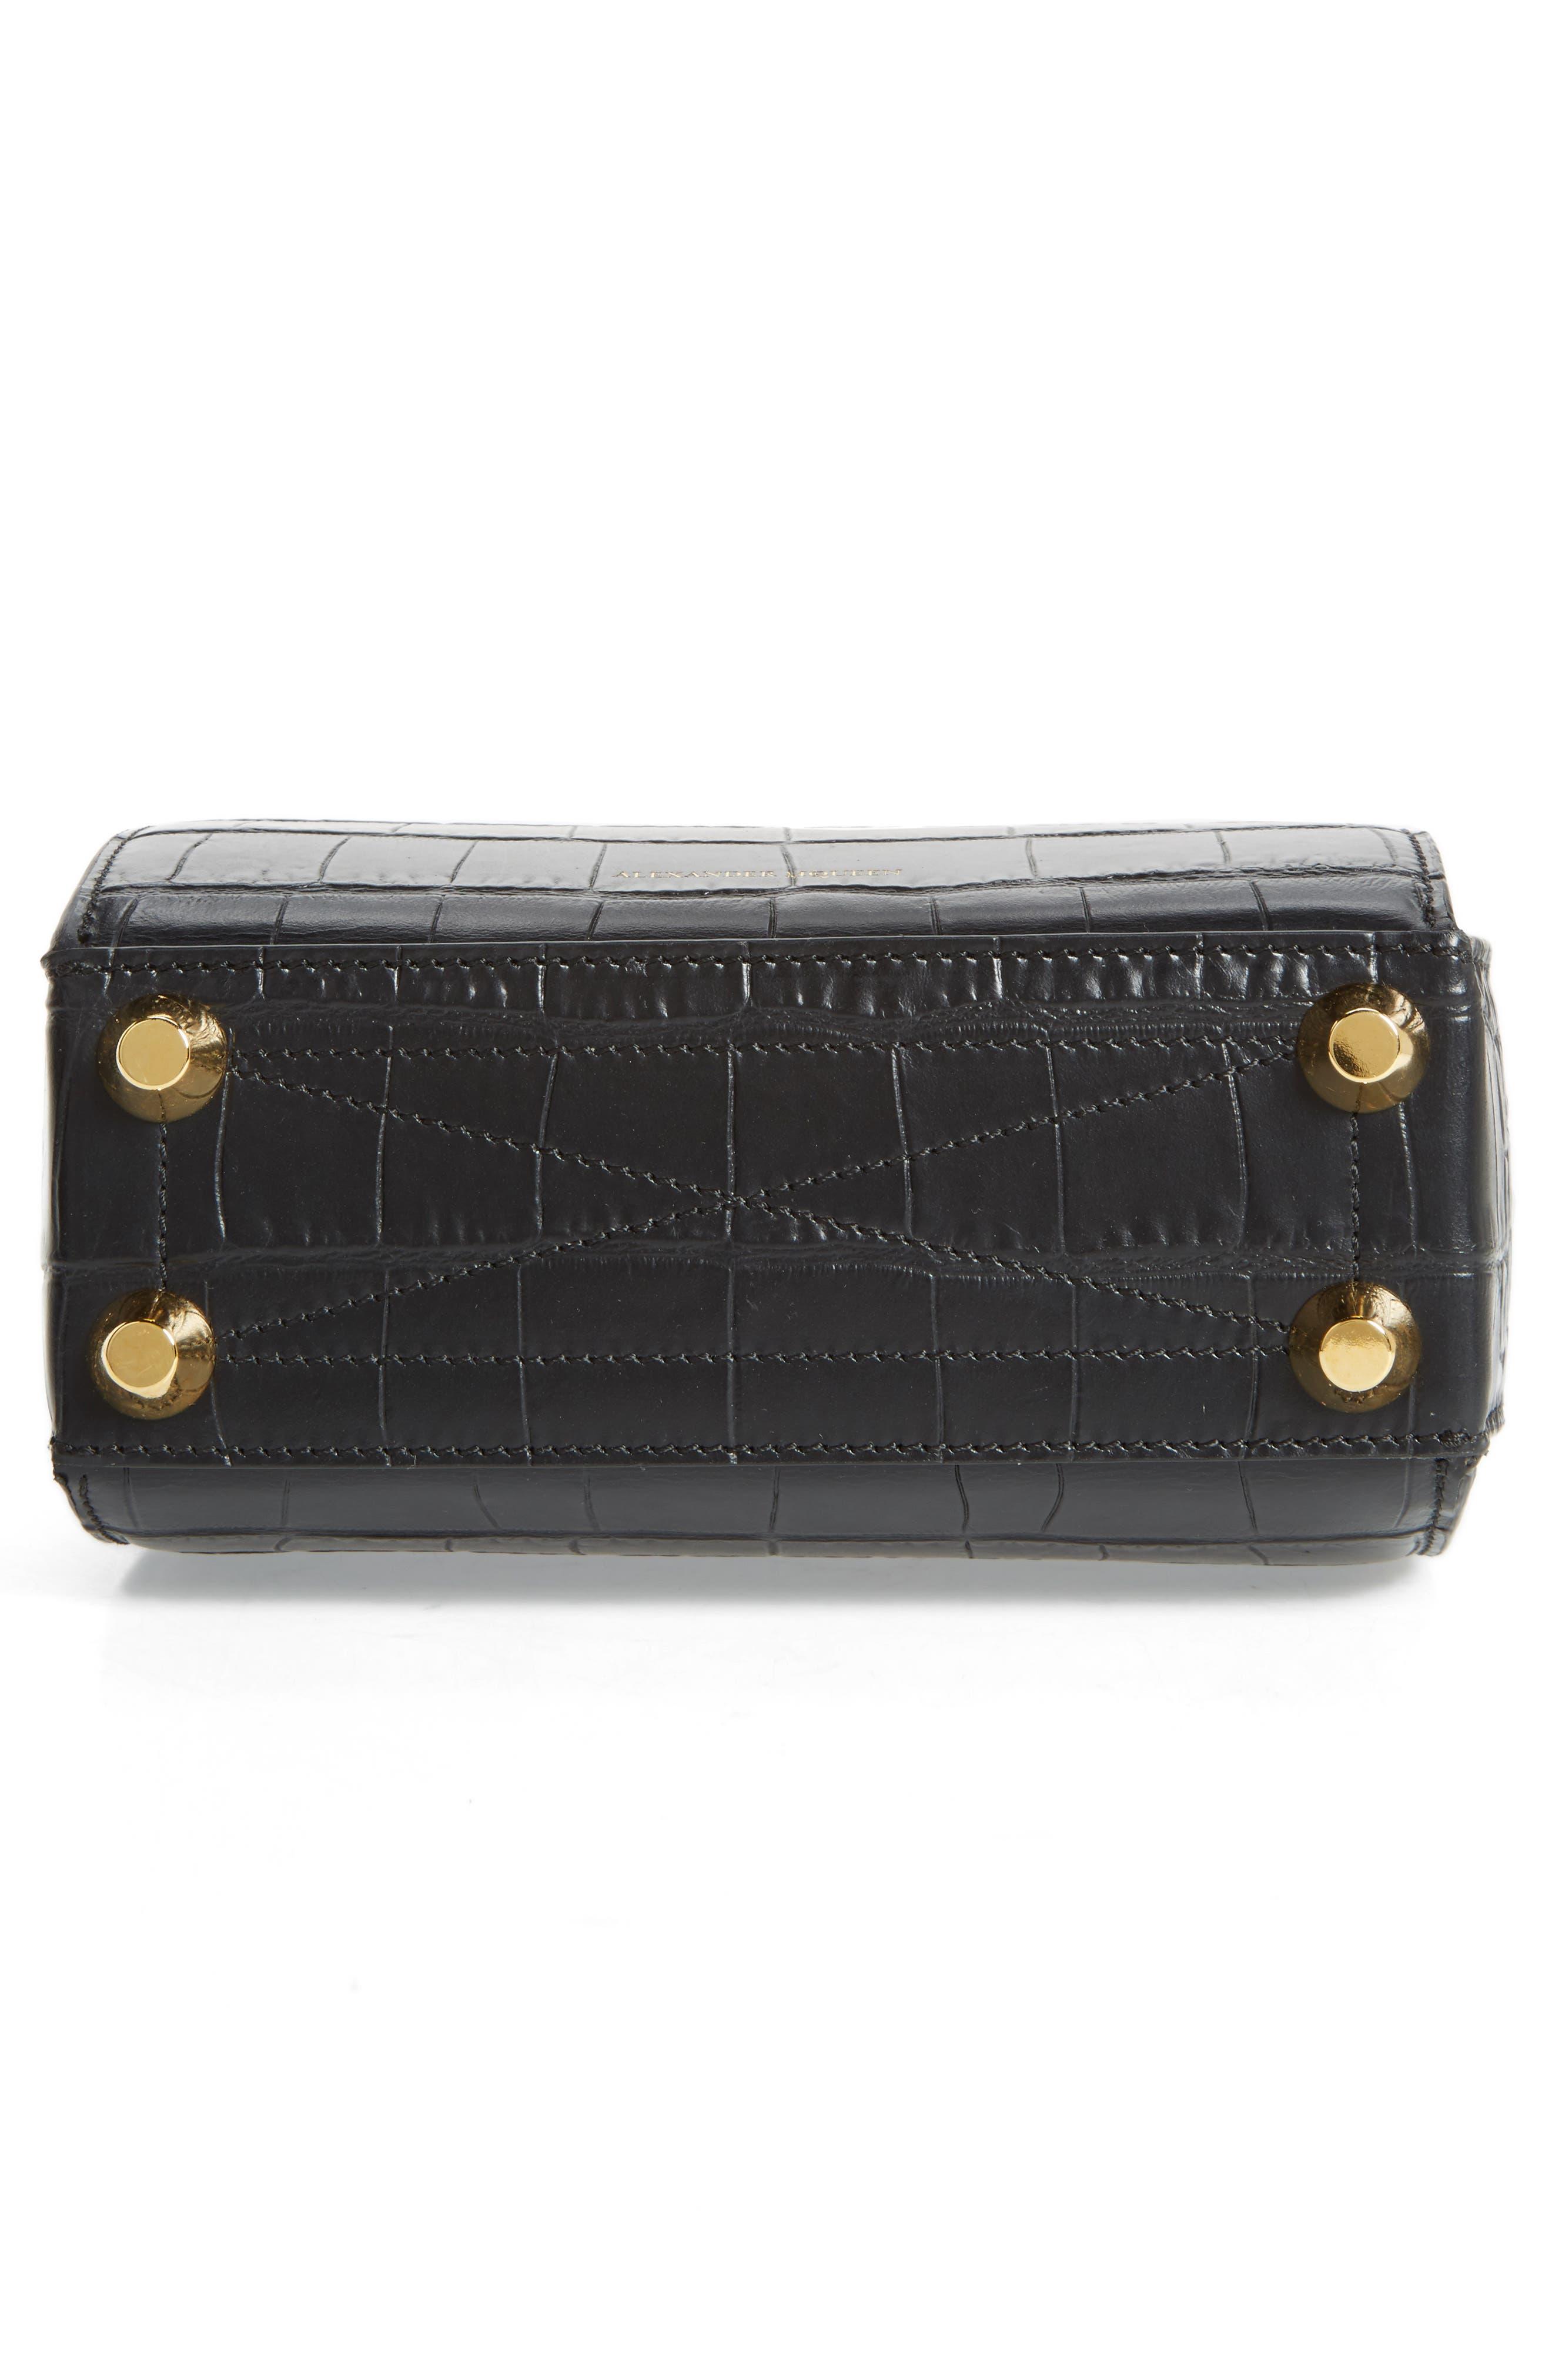 Box Bag 19 Croc Embossed Leather Bag,                             Alternate thumbnail 6, color,                             BLACK